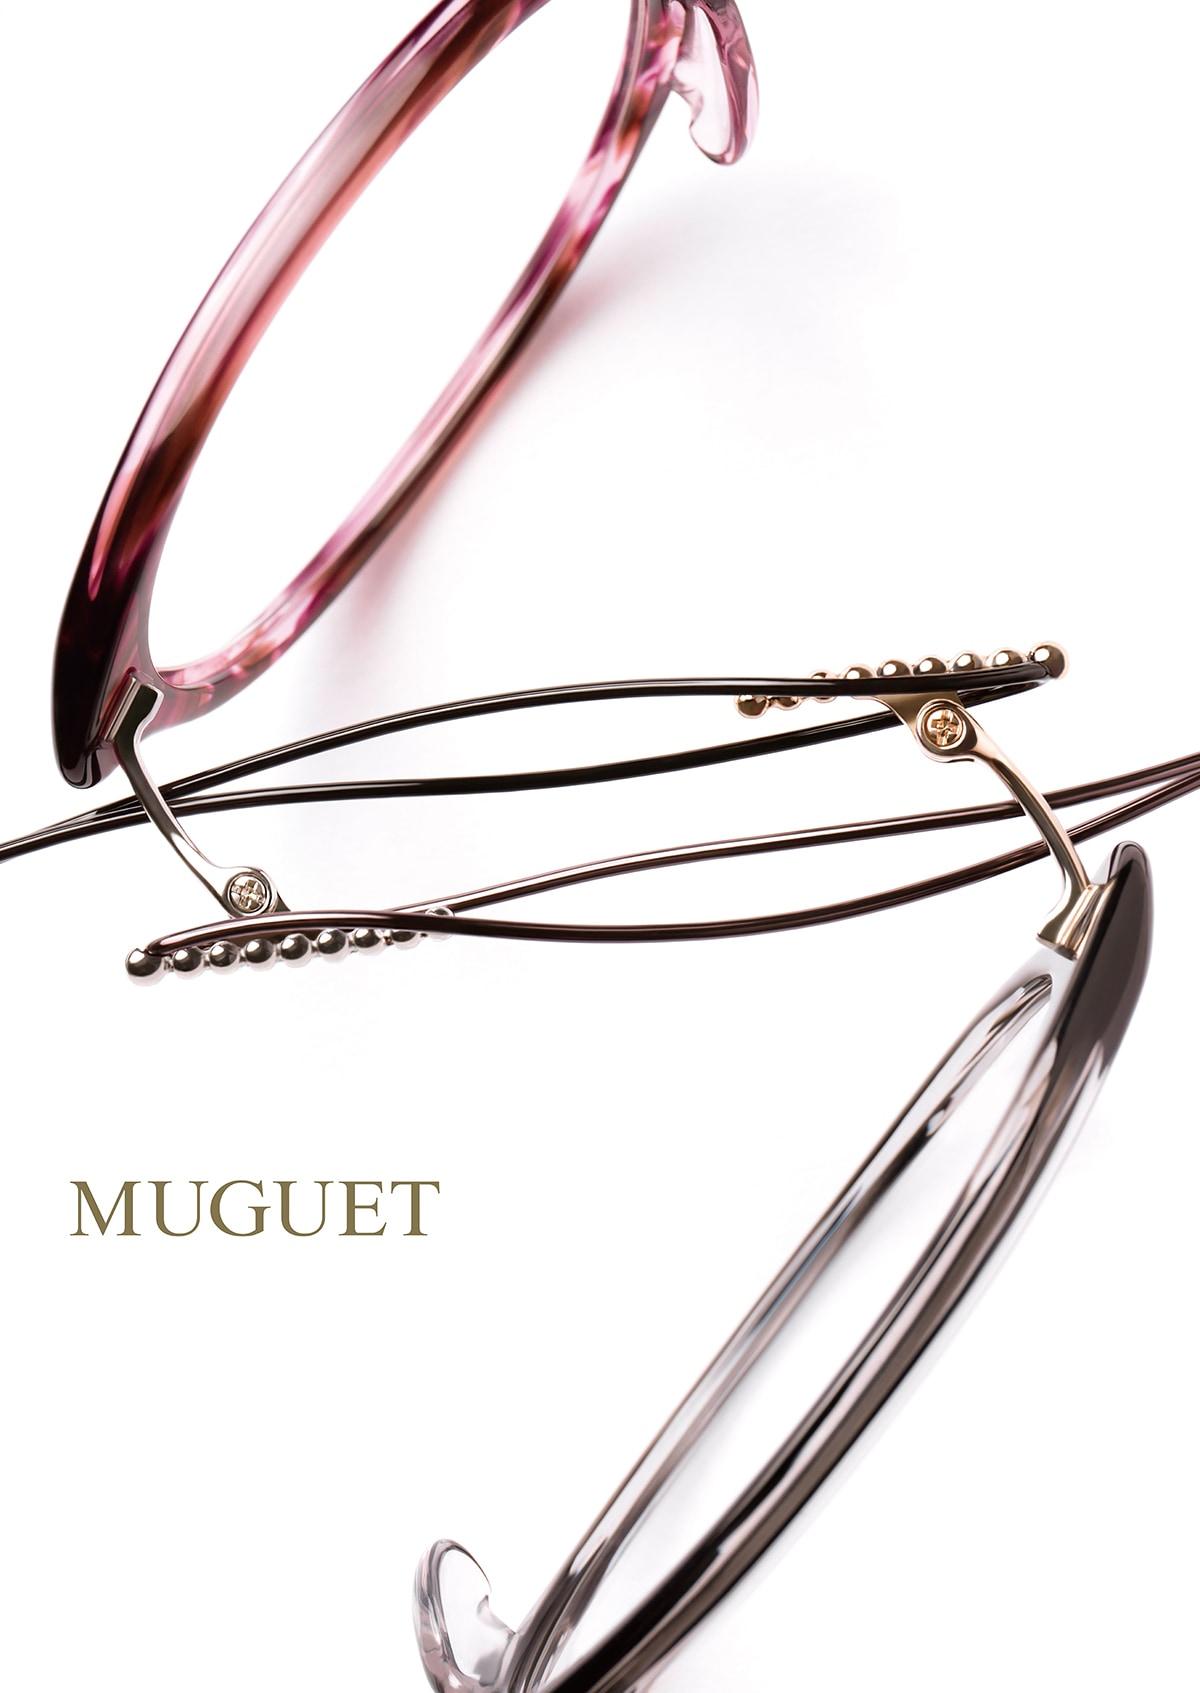 MUGUET 「やさしさと凛」